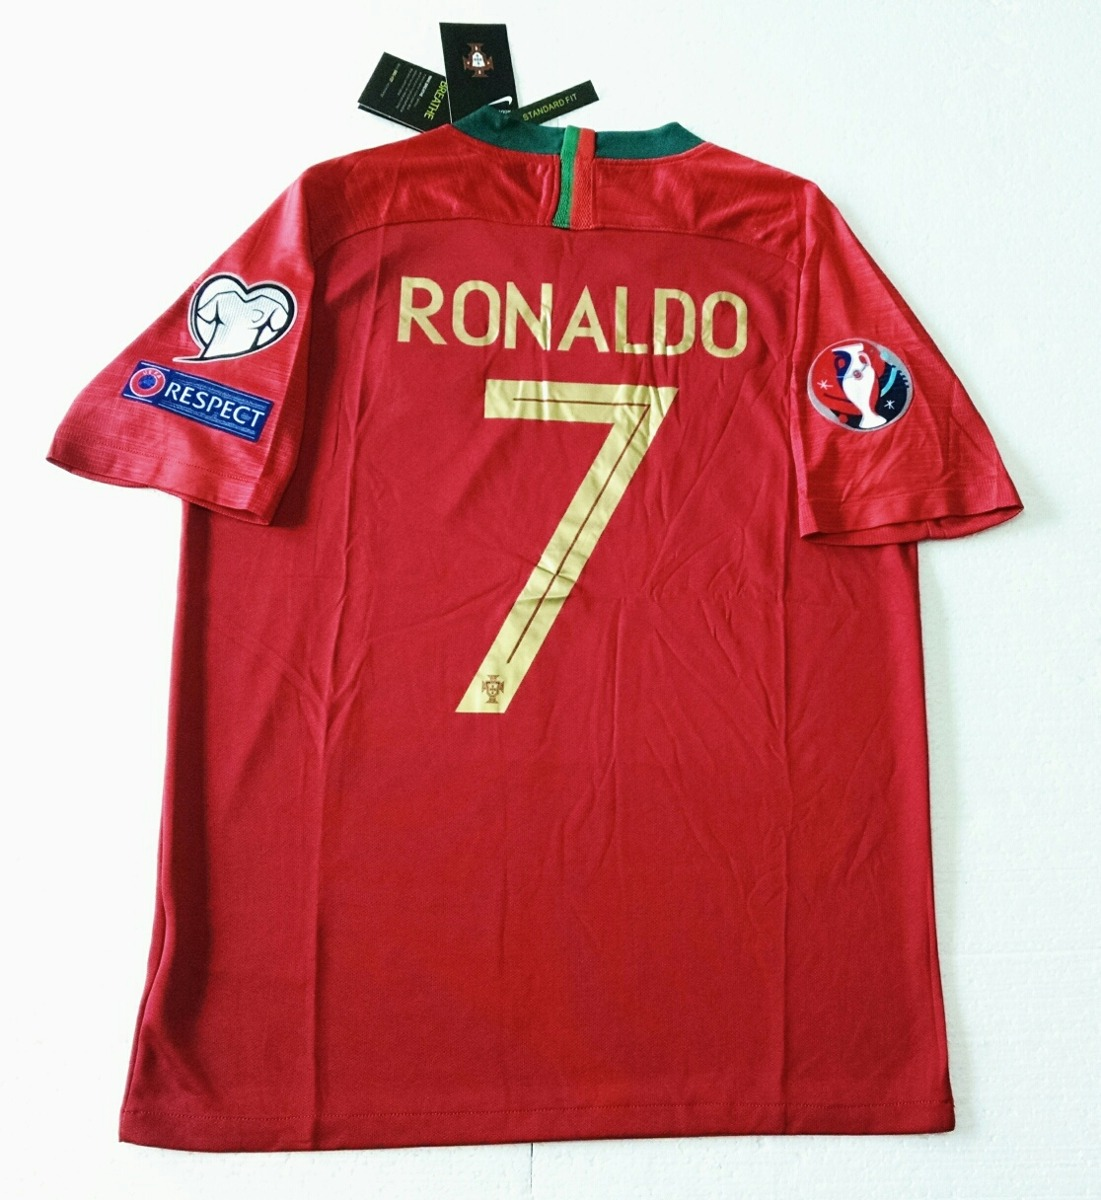 camisa portugal home 2018 - cr7. Carregando zoom. 5b0577841bc53